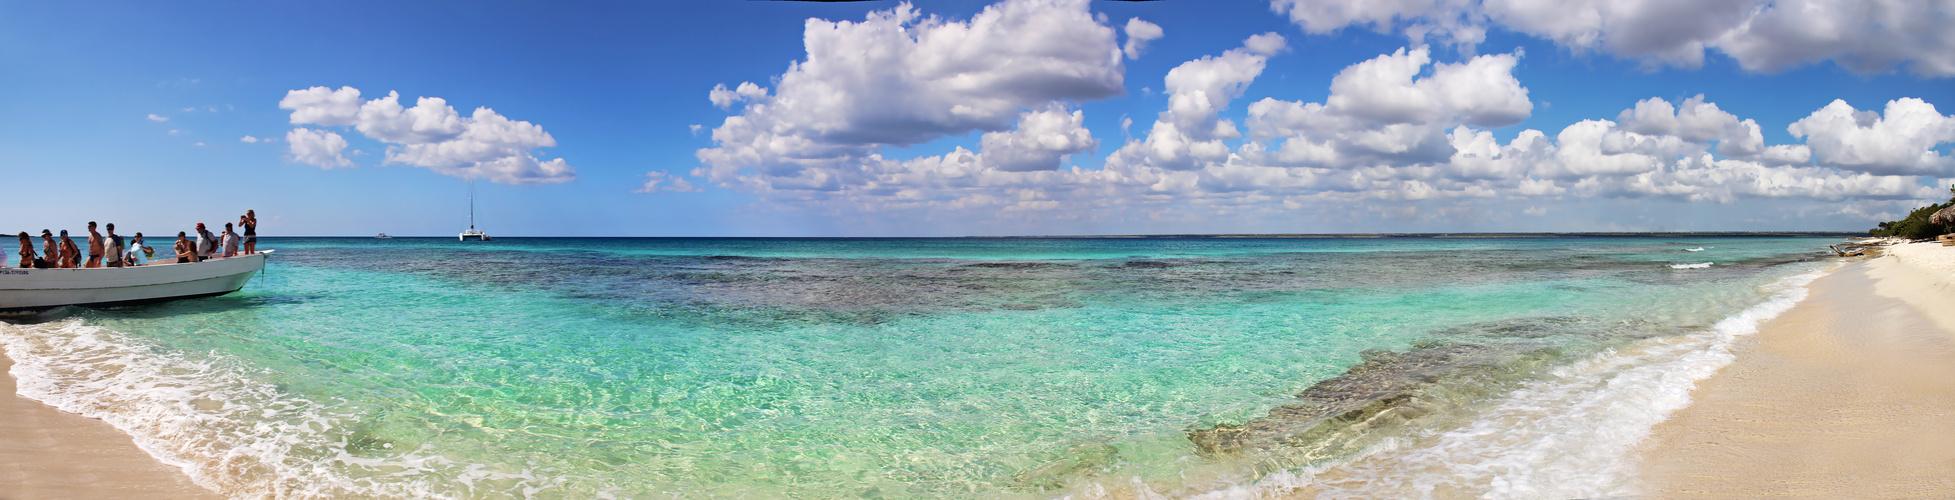 Karibik - Isola Catalina